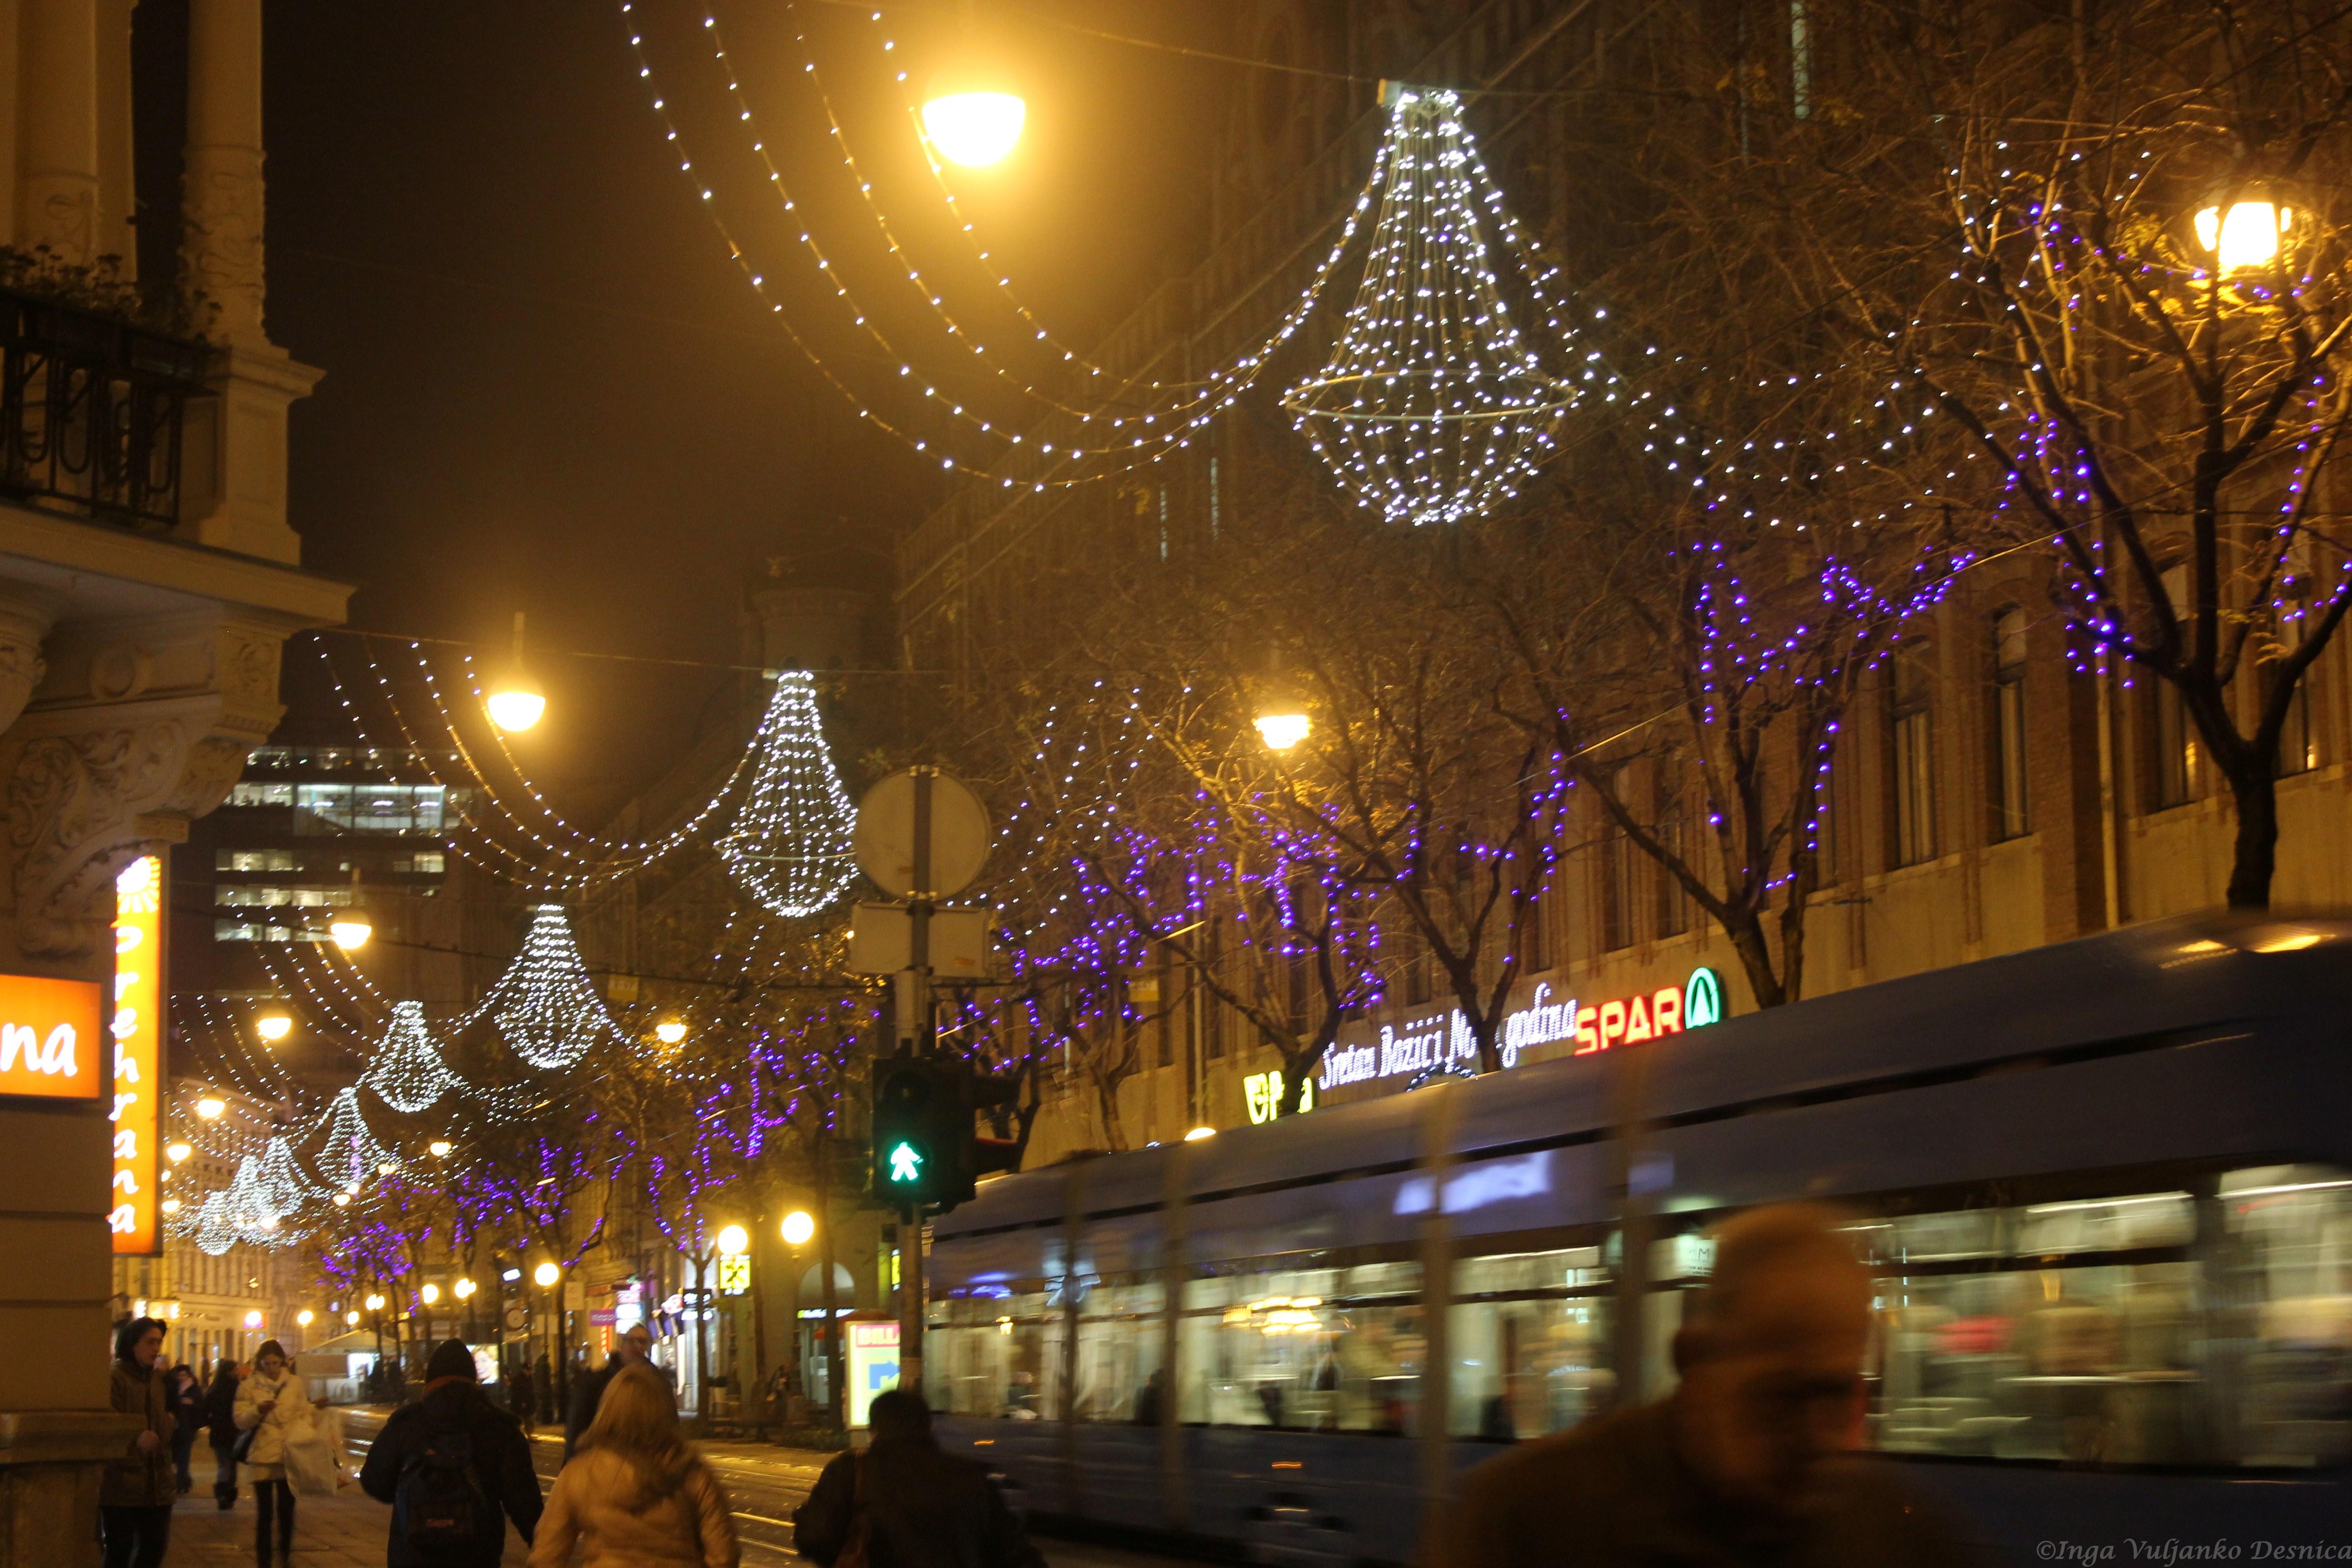 Wallpaper : street light, city, cityscape, night, sky, winter, evening, town, Christmas Tree, holiday, christmas lights, decorations, metropolis, Croatia, ...